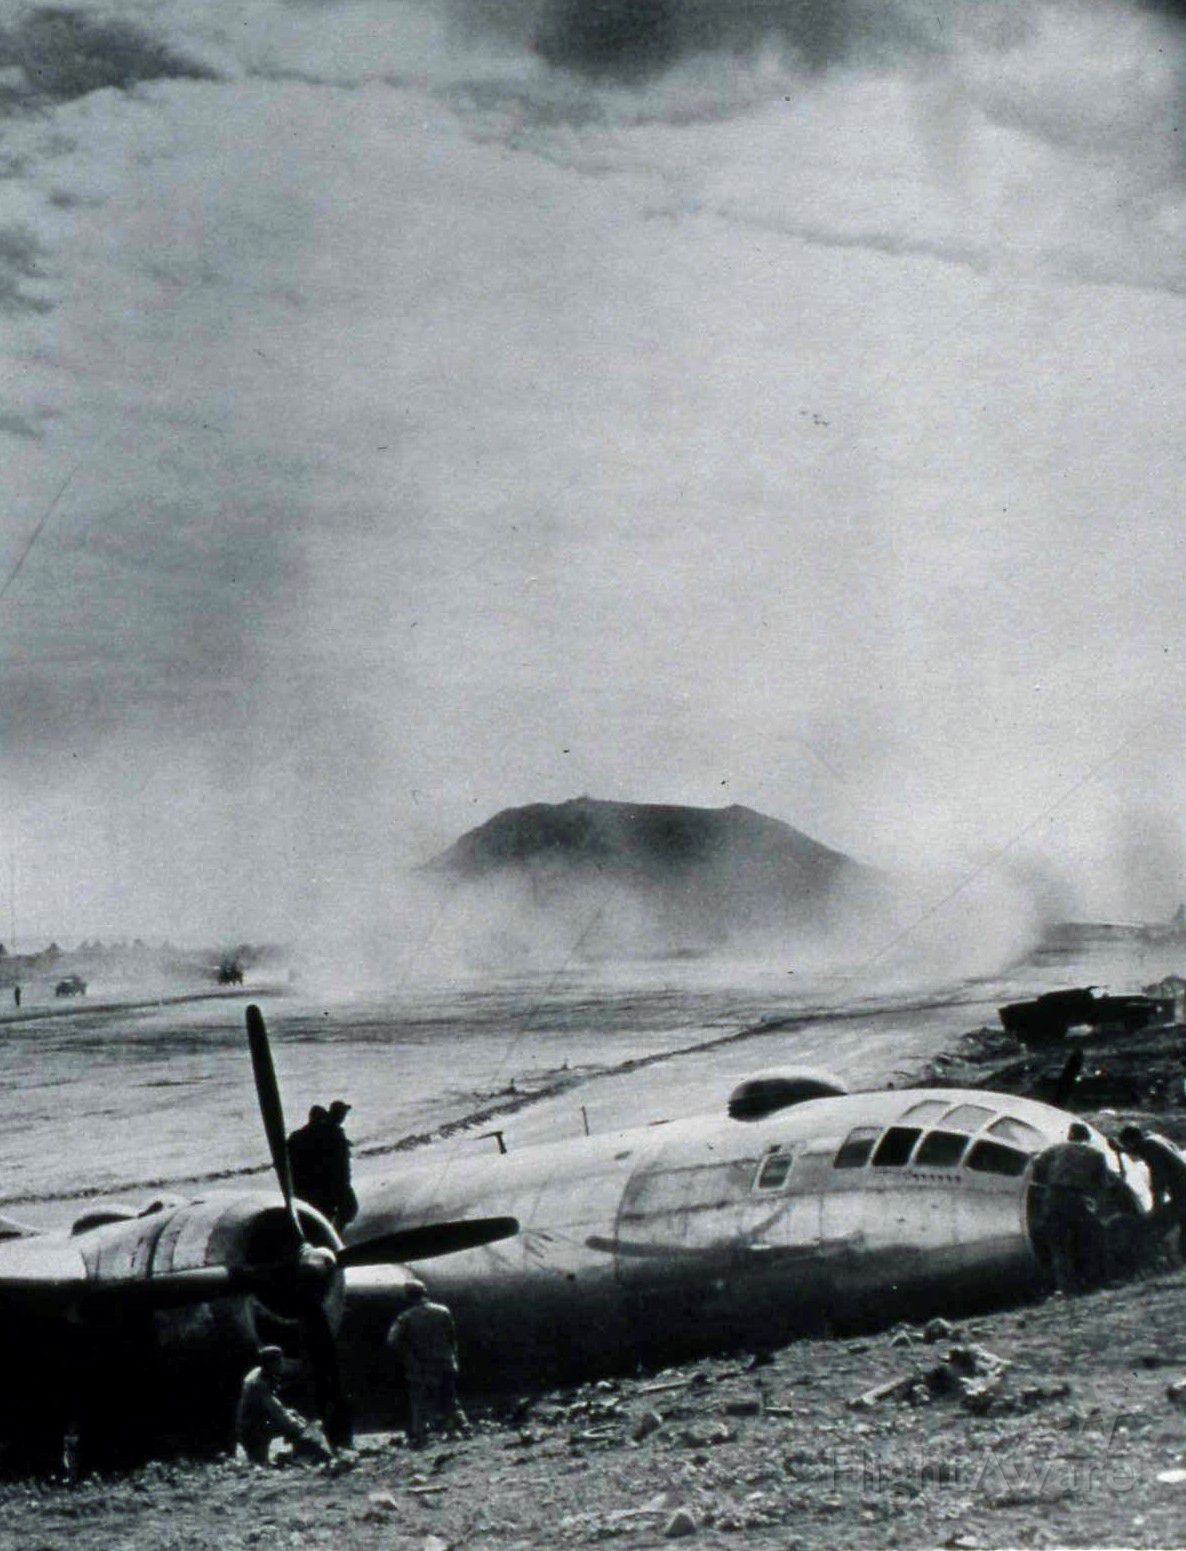 Boeing B-29 Superfortress — - On beach near Suribachi